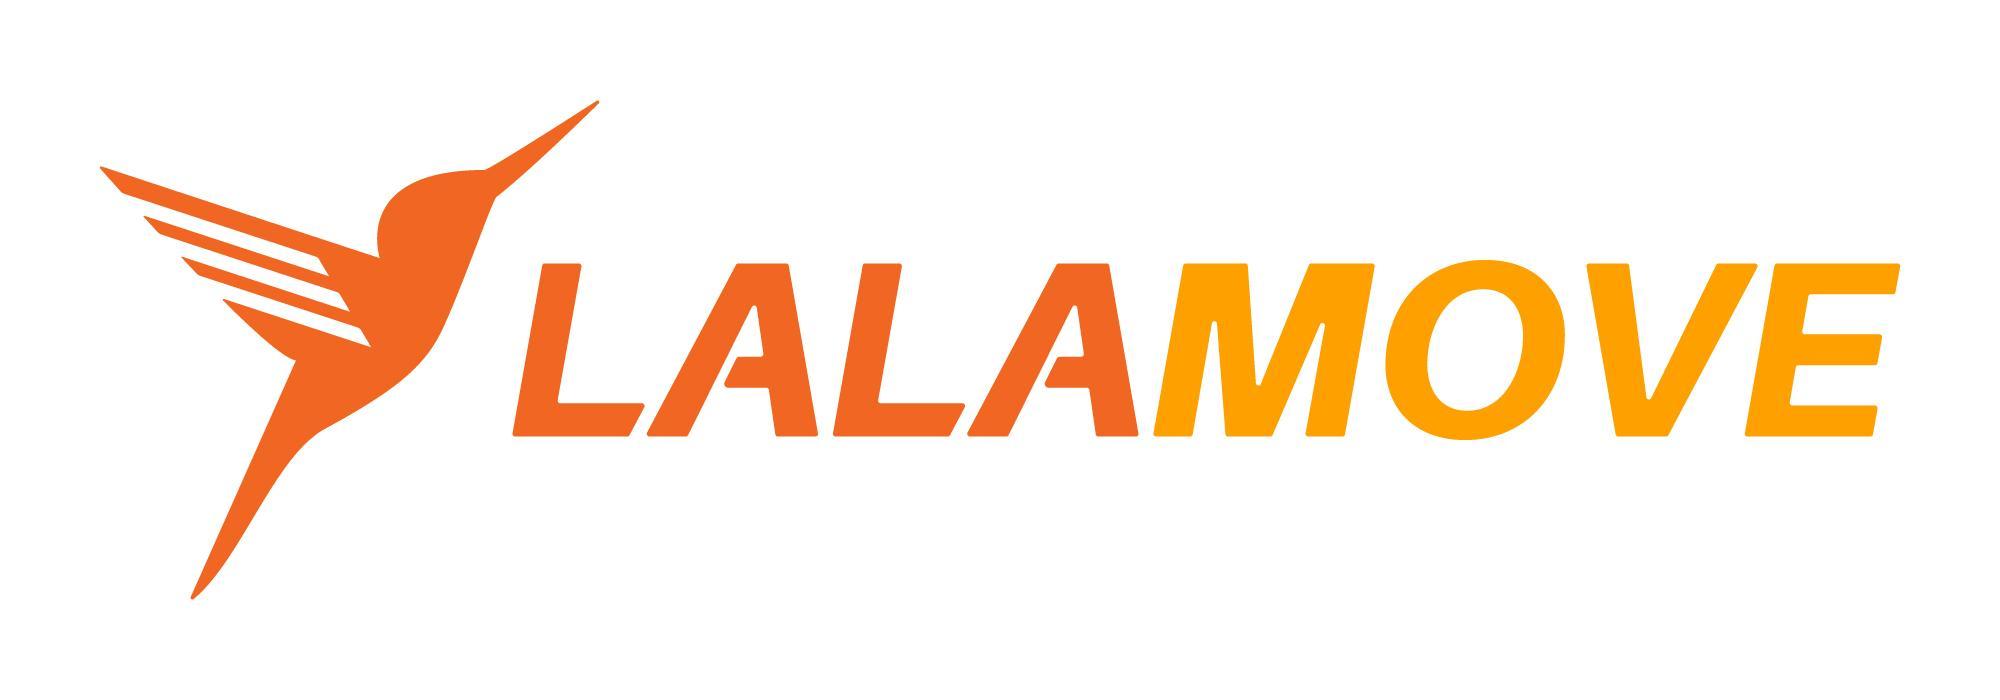 Lalamove Philippines